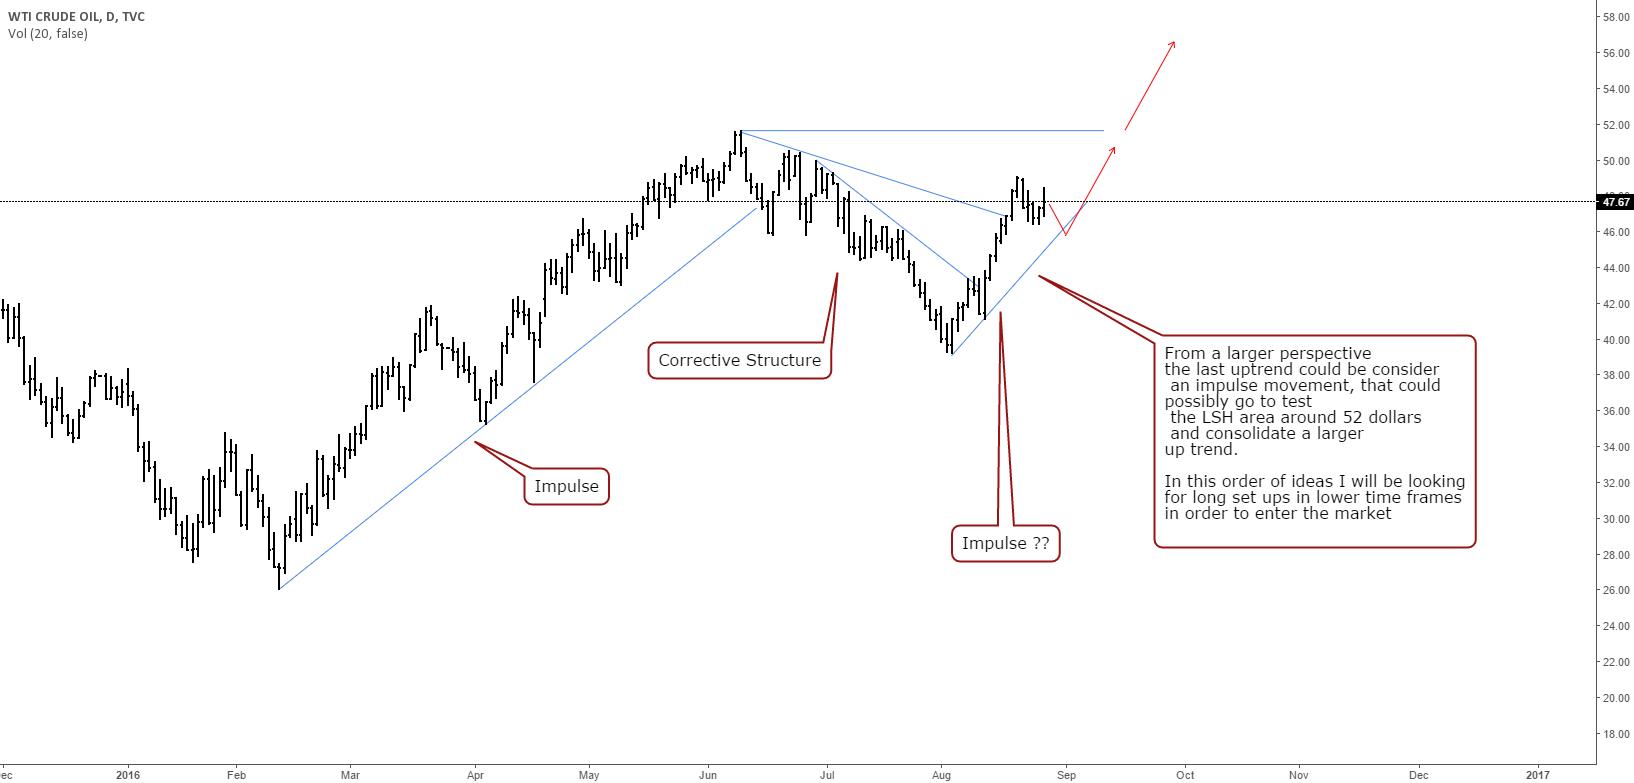 Long scenario for OIL